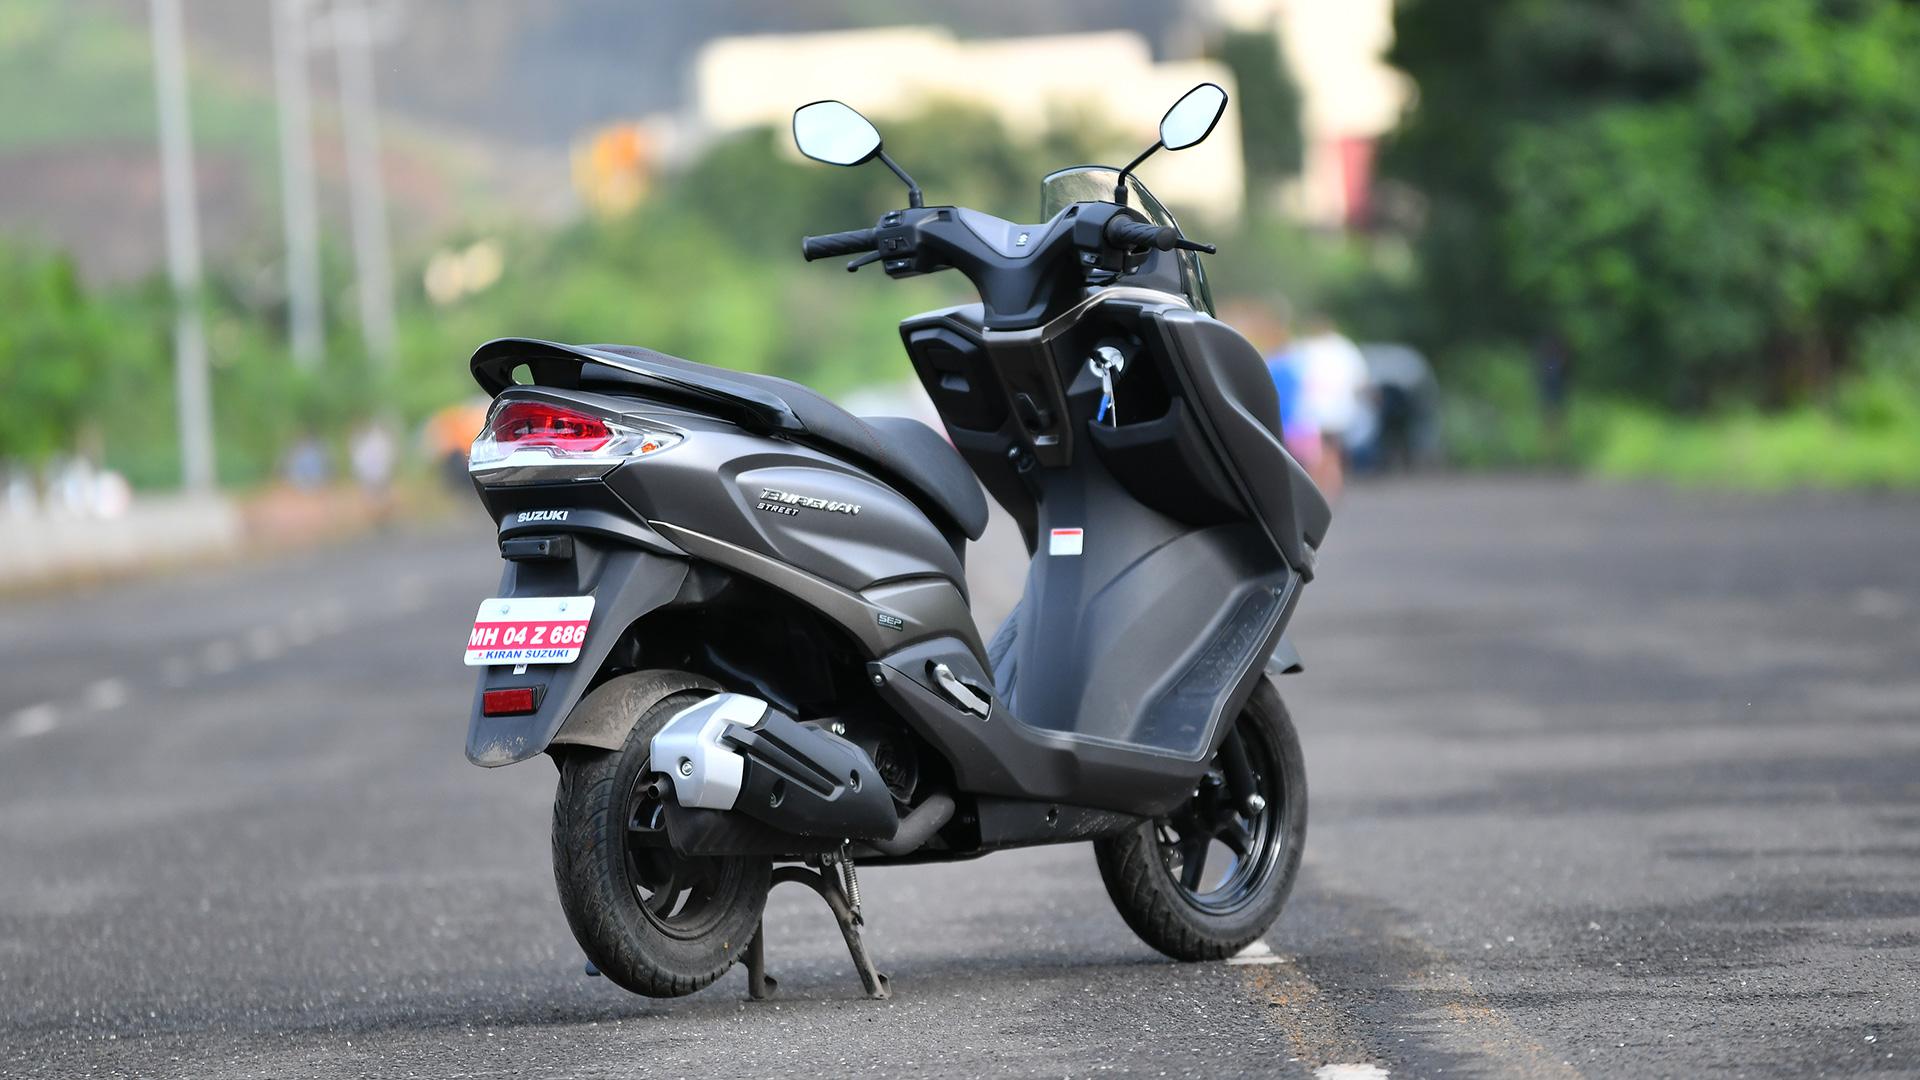 Suzuki Burgman 2018 Street 125 Compare